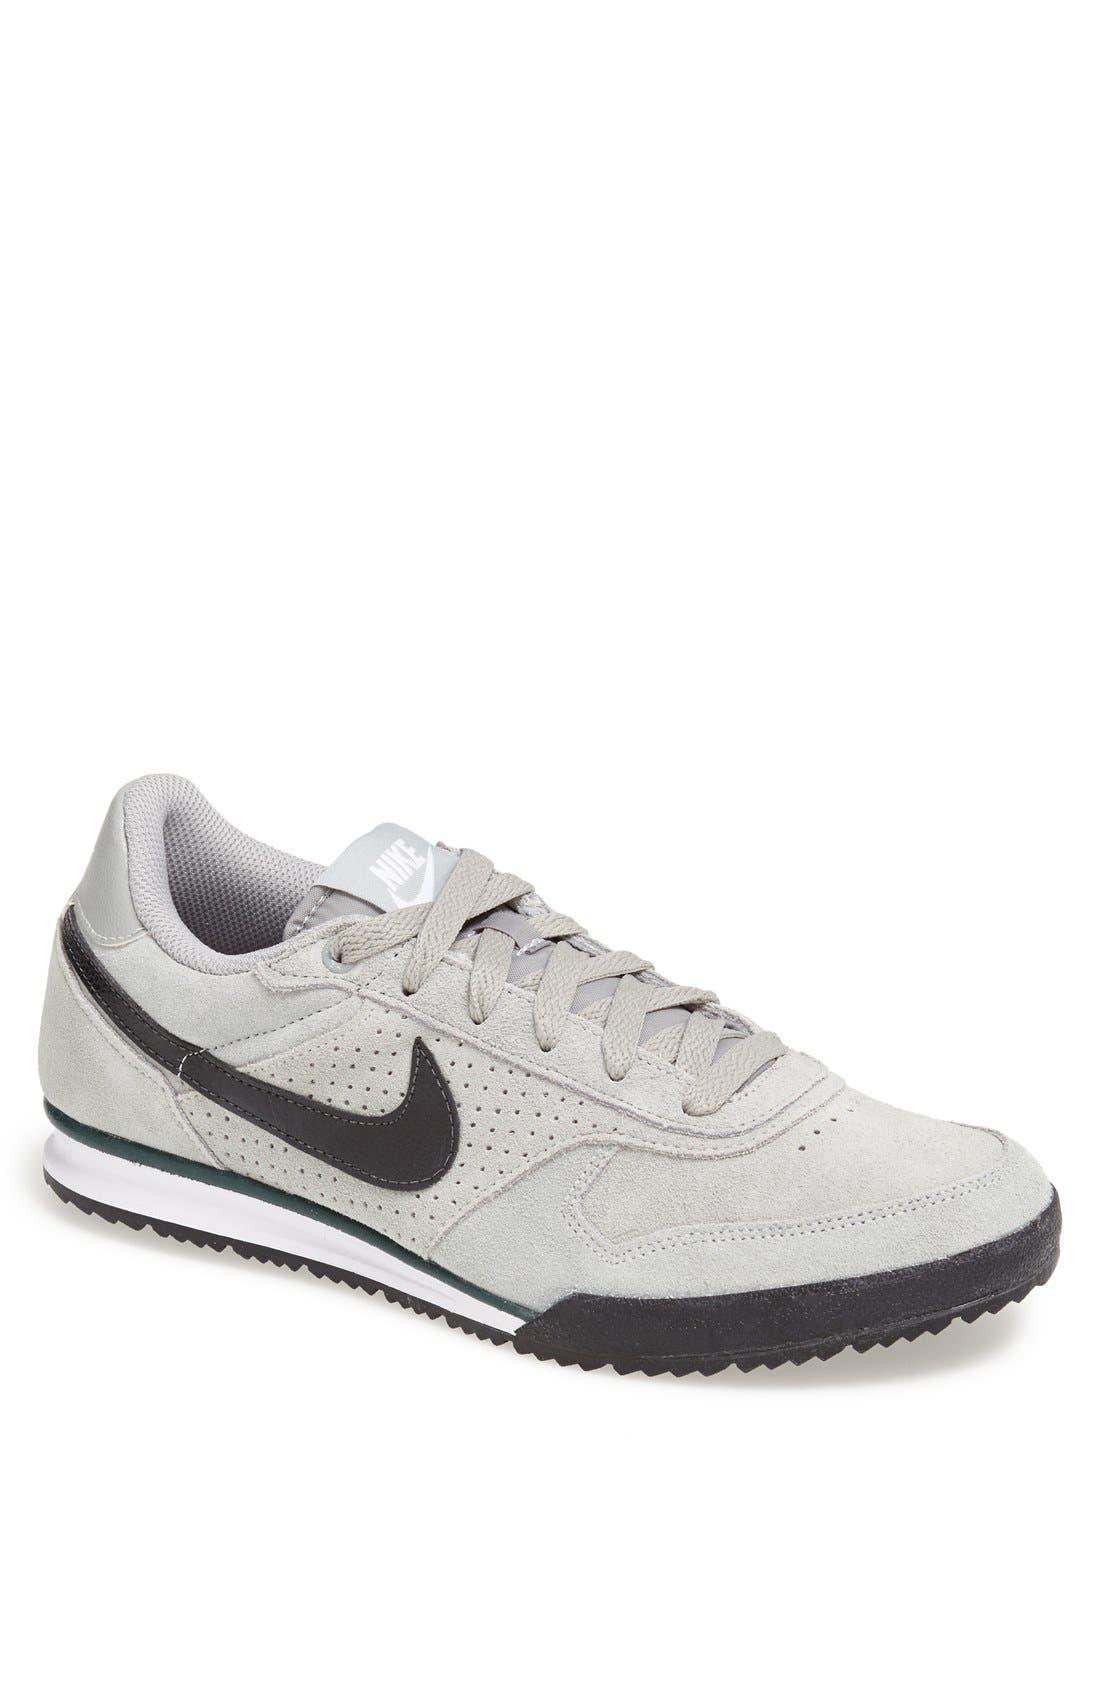 Main Image - Nike 'Field Trainer' Sneaker (Men)